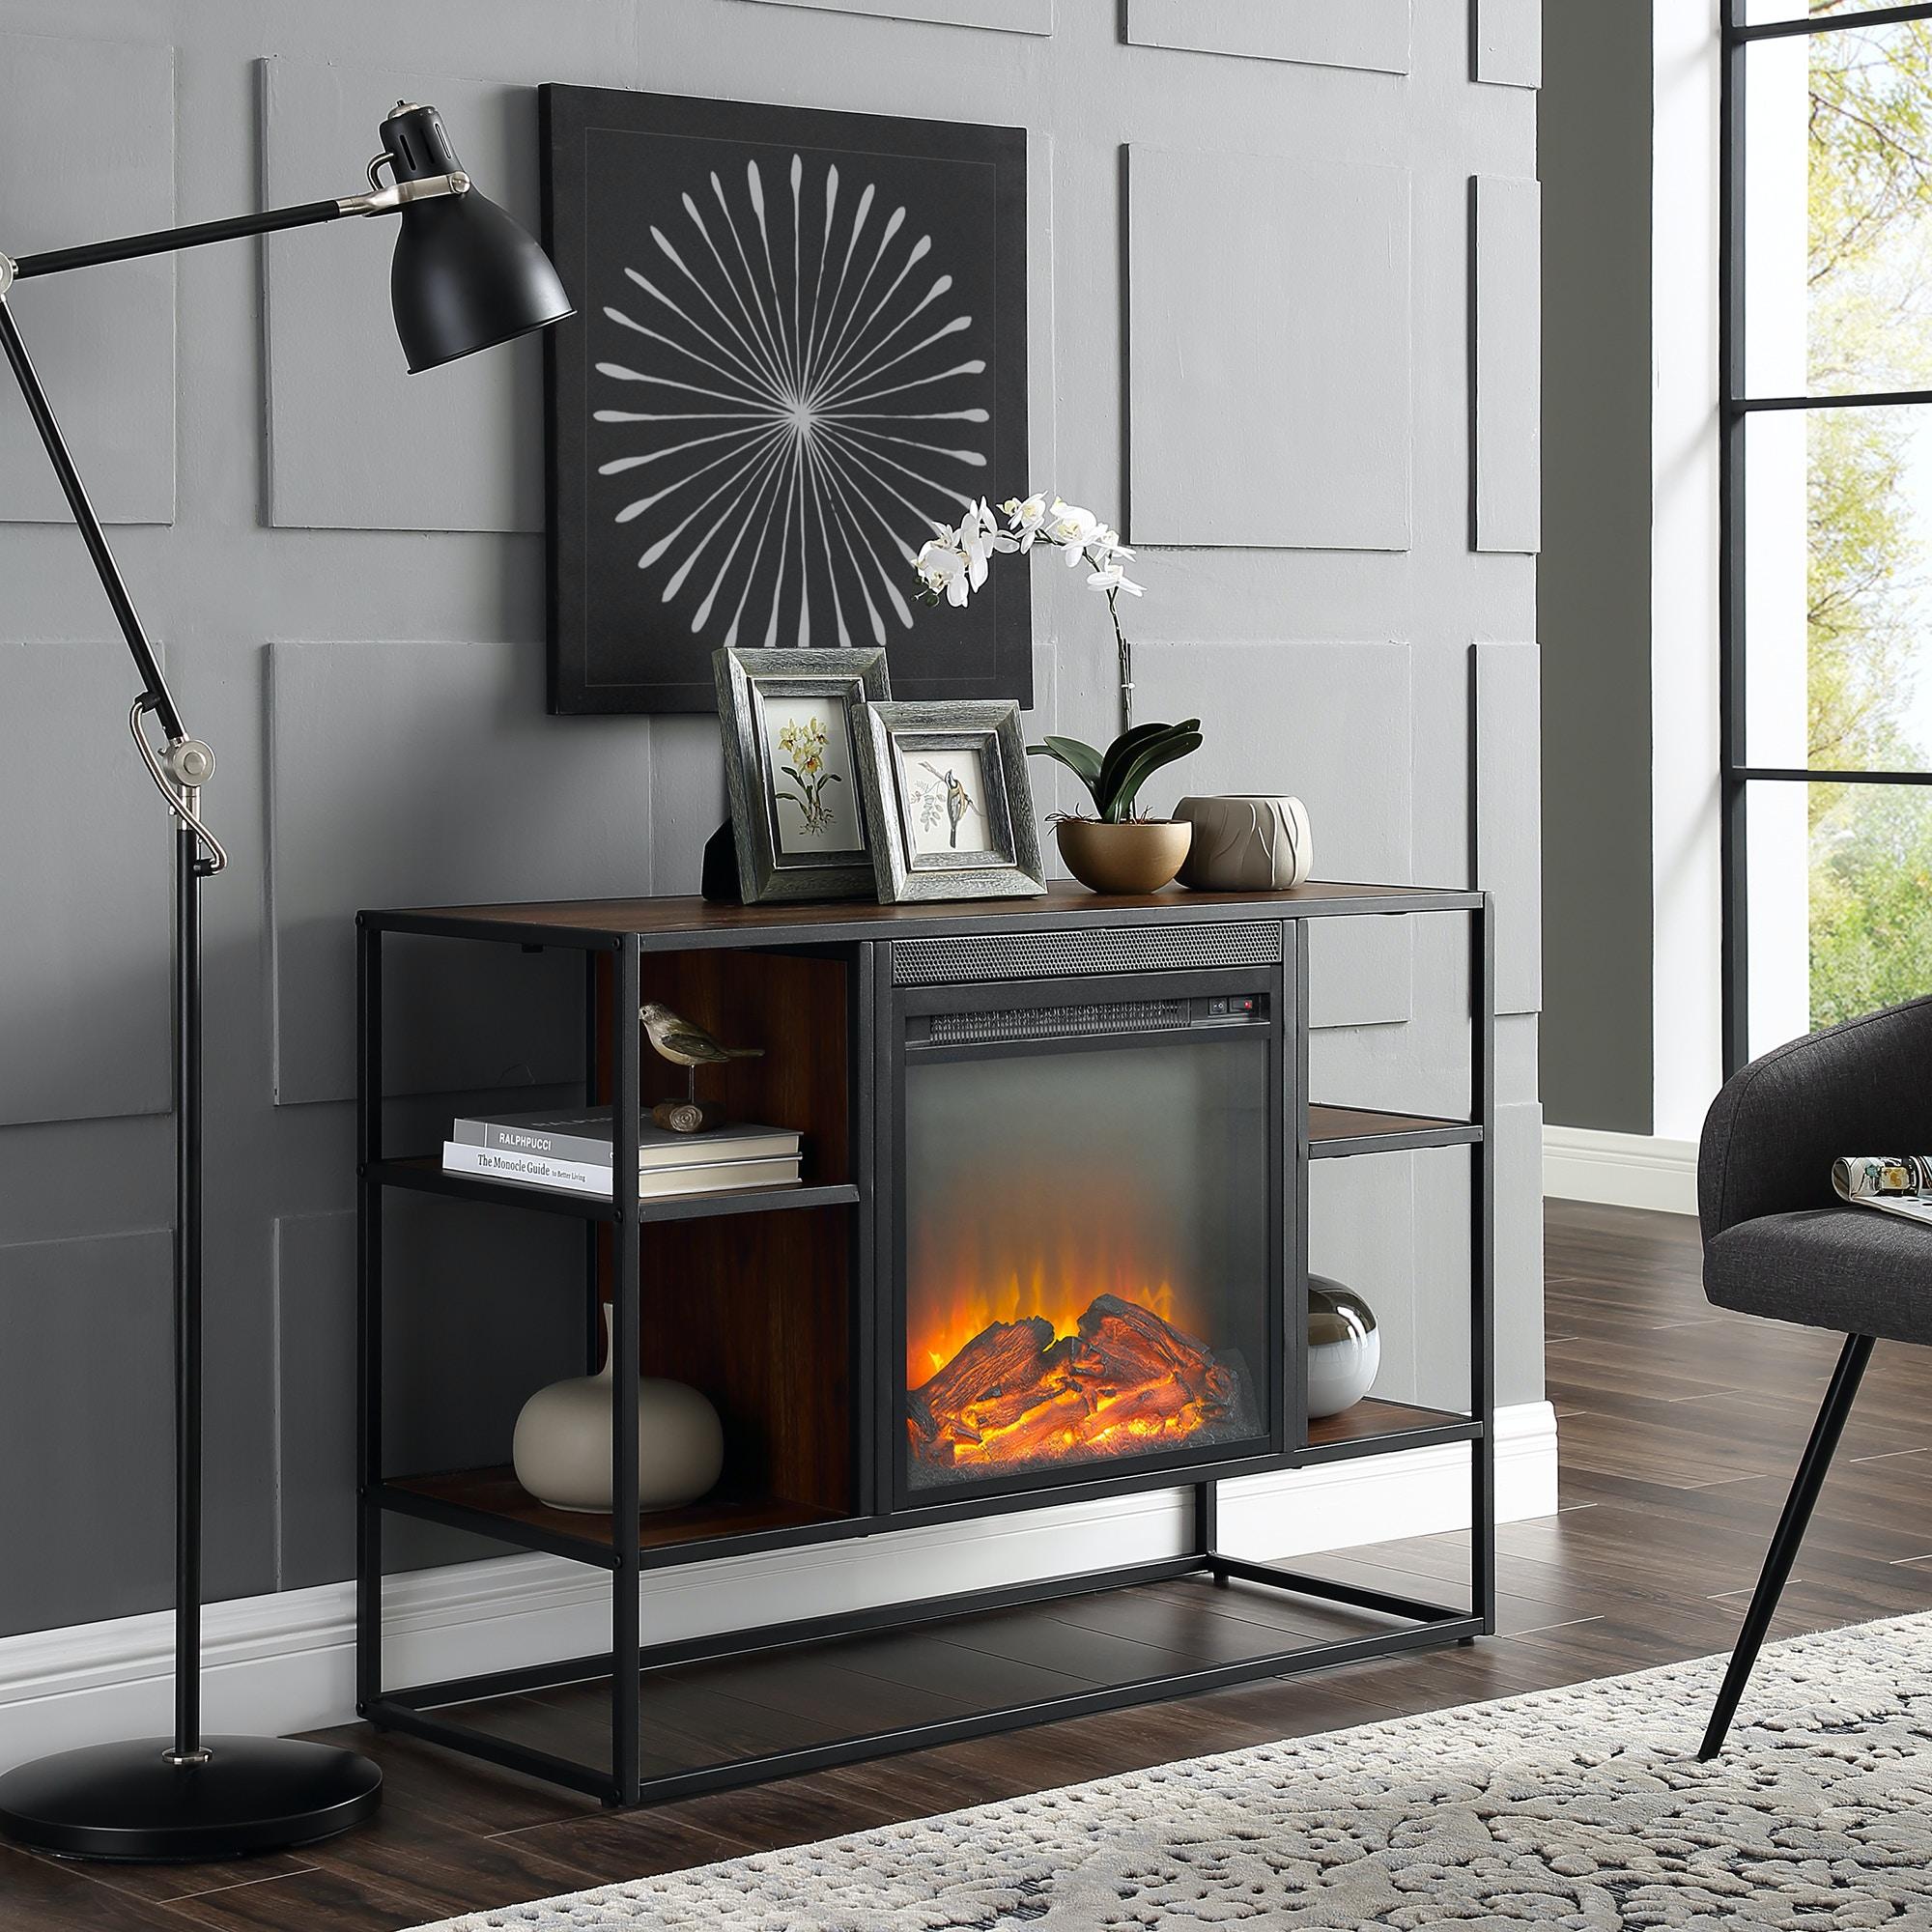 40 Rustic Urban Industrial Metal And Wood Open Shelf Fireplace Tv